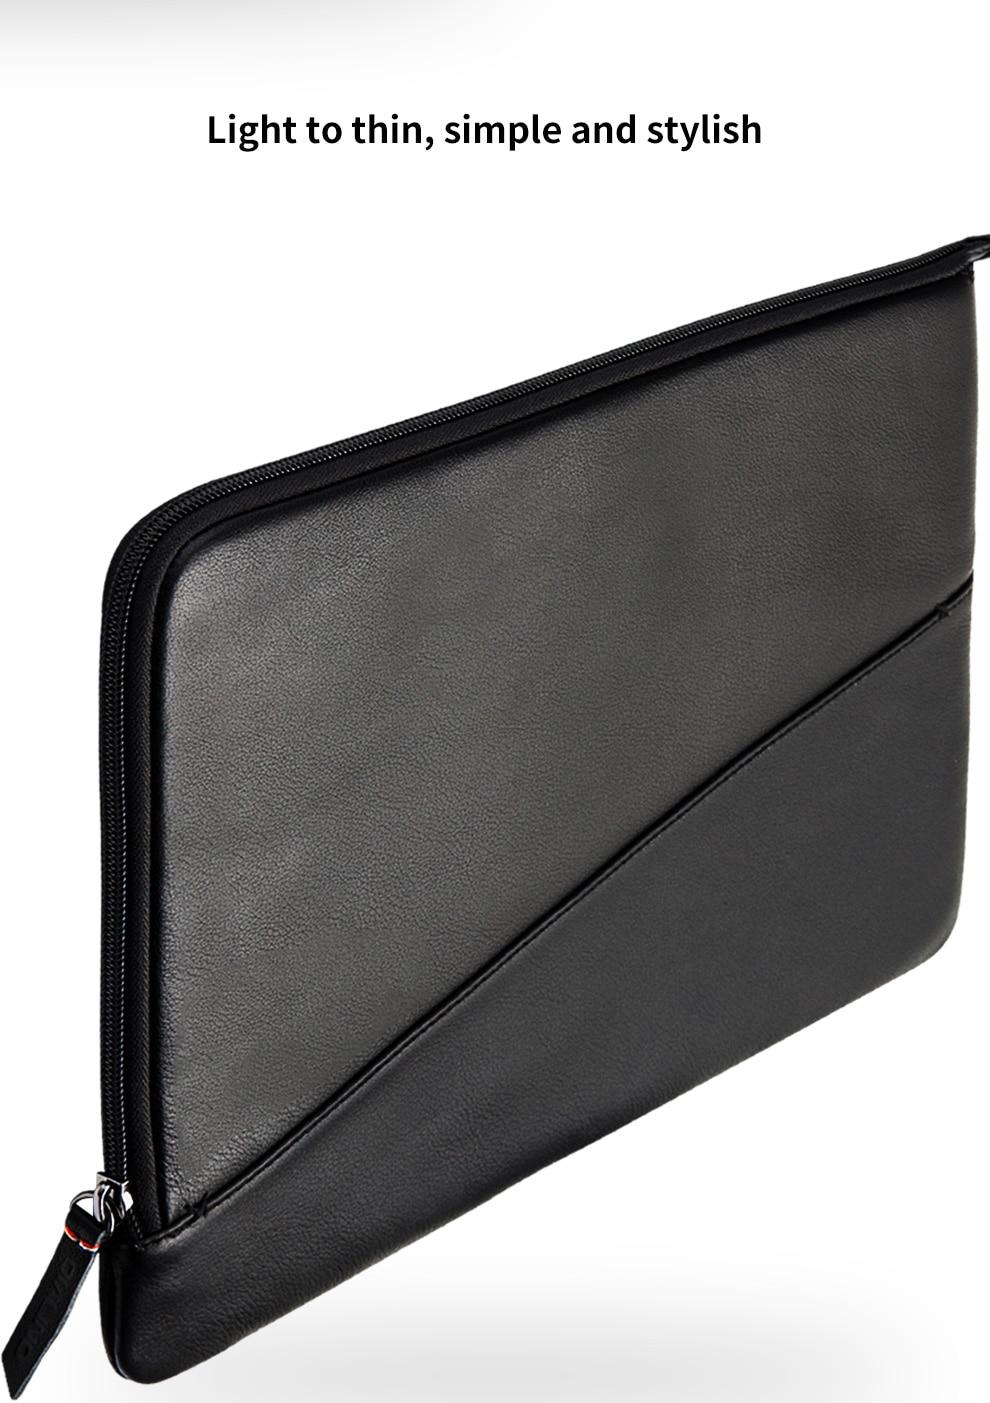 Leather leather Macbook case liner bag